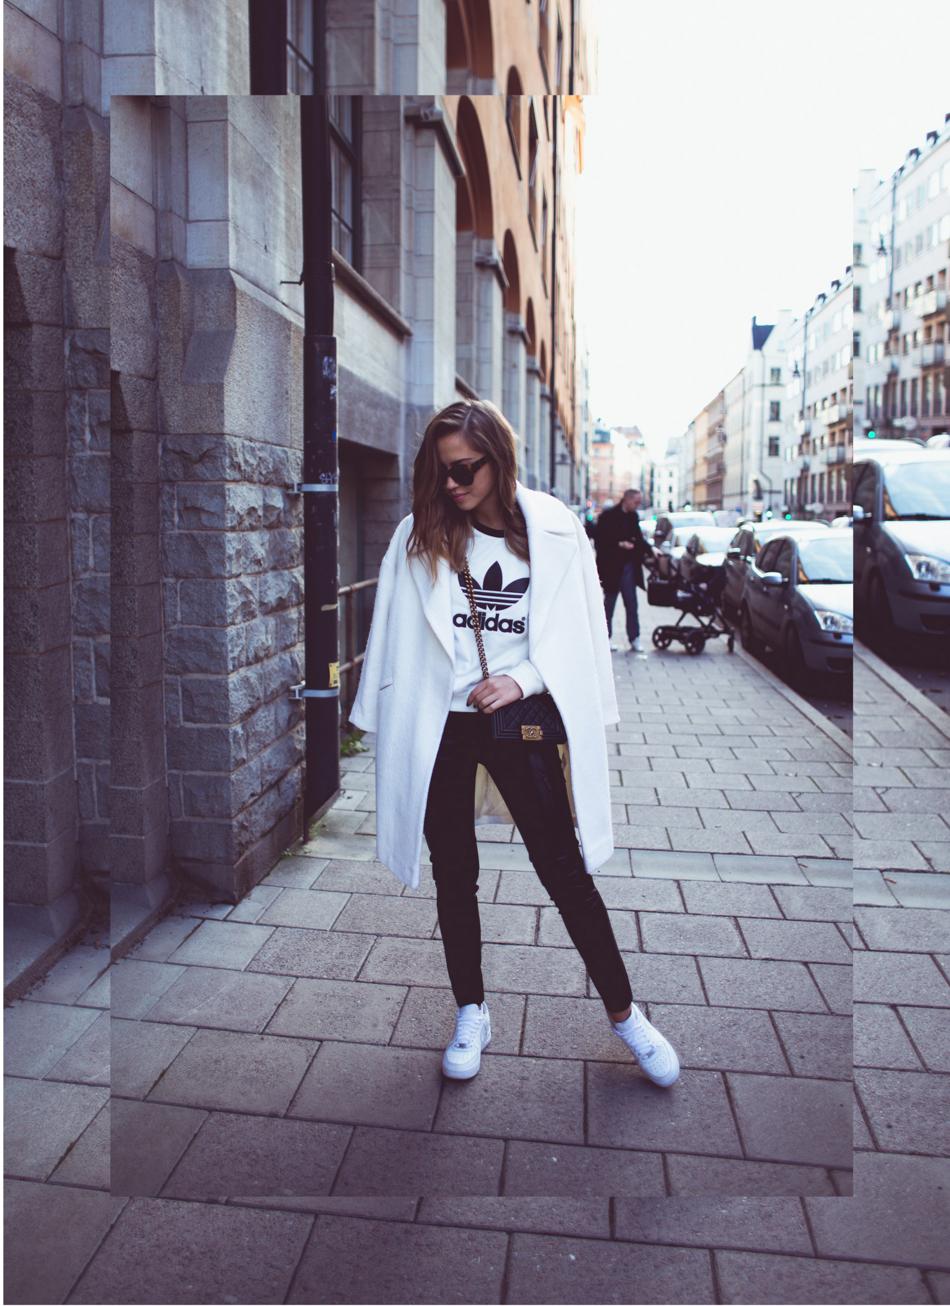 KenzaZouiten_whitecoat_adidass-1